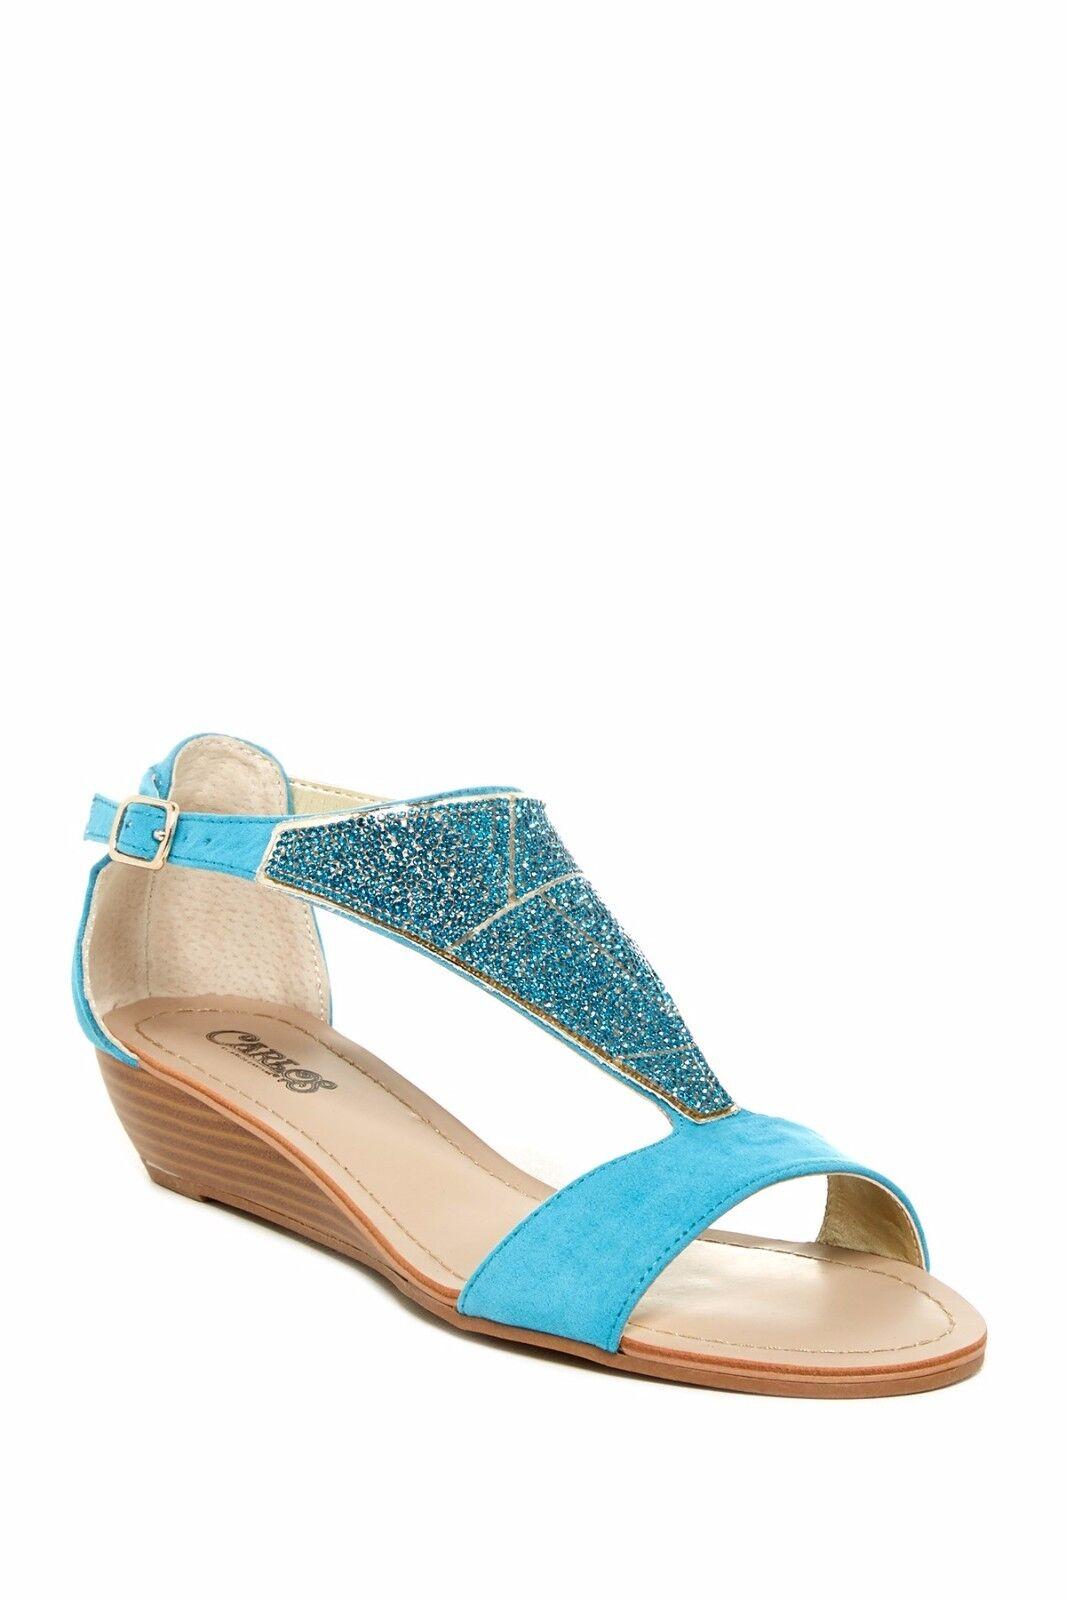 New Carlos By Carlos Santana Glisten Embellished Sandals size 6.5